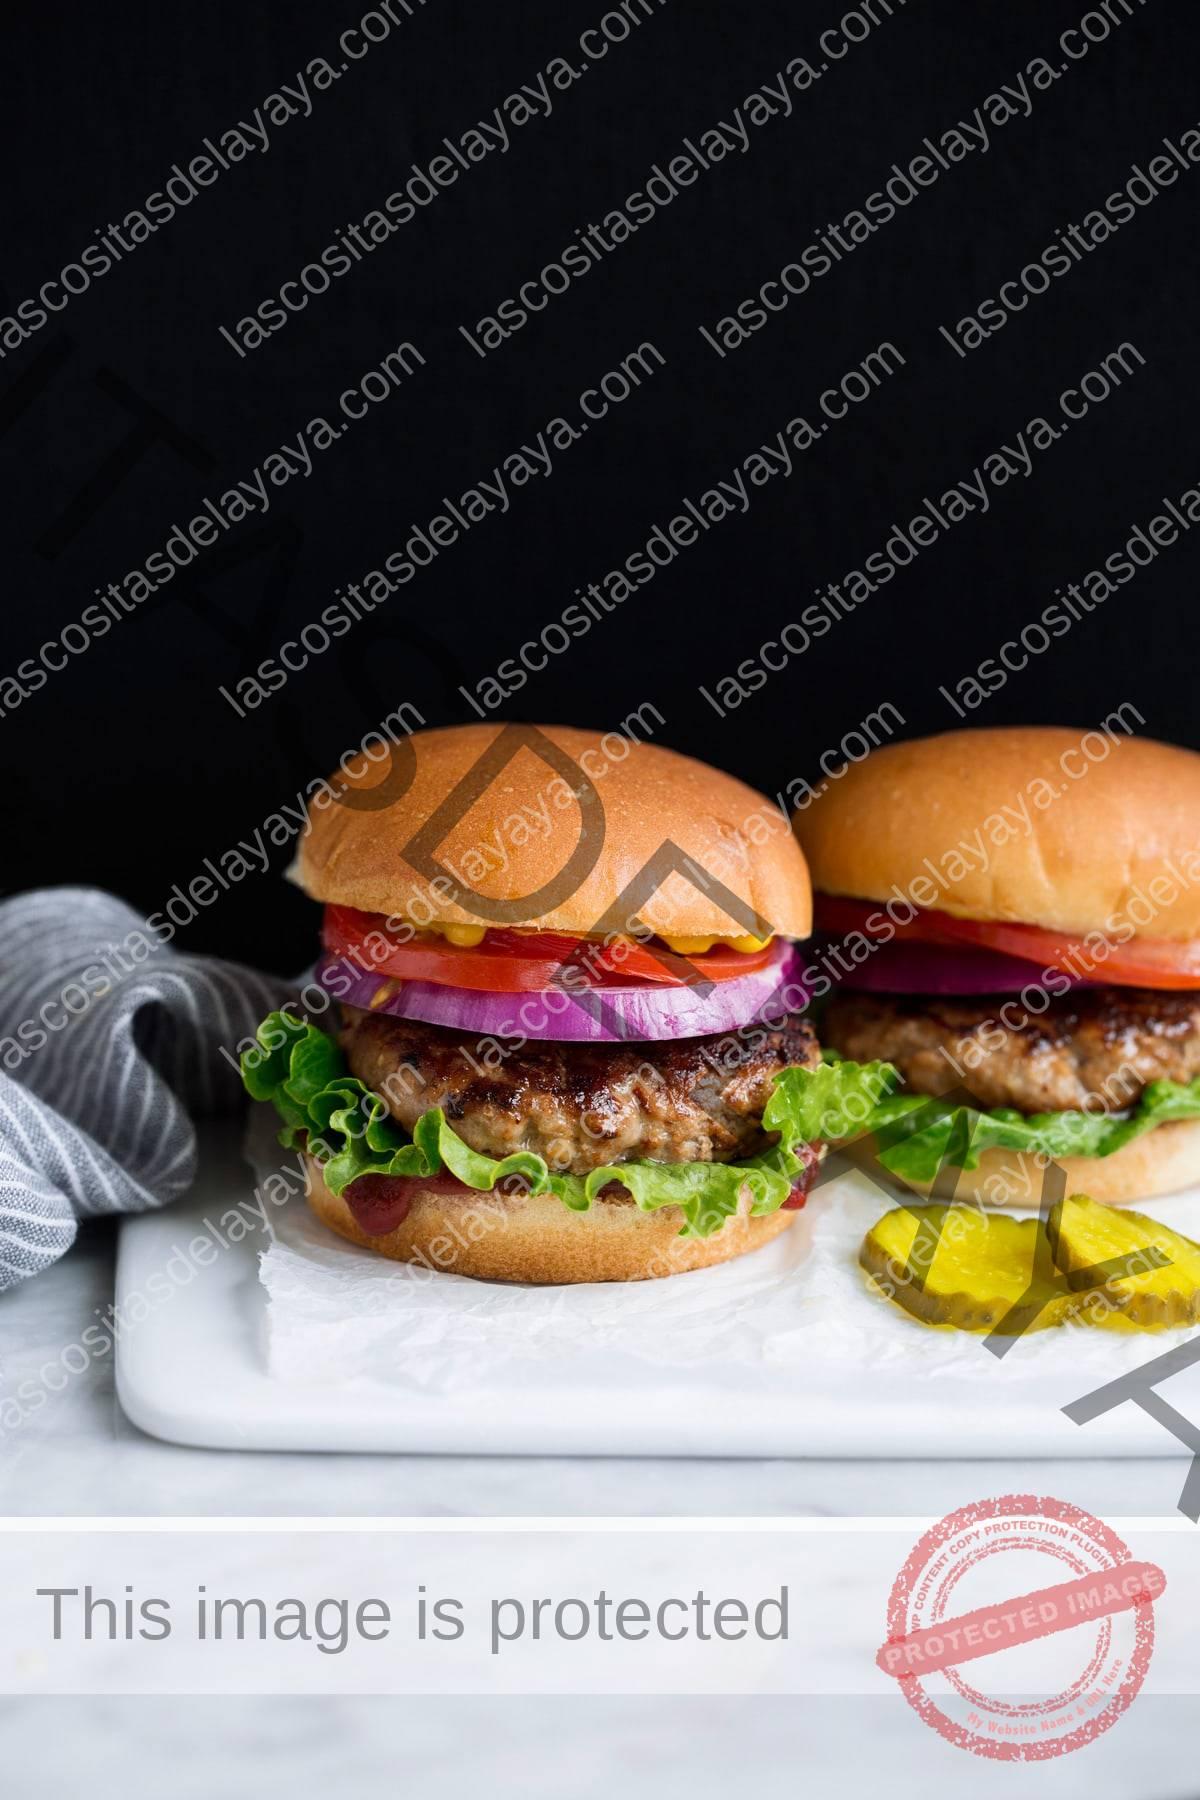 Dos hamburguesas de pavo en un plato blanco.